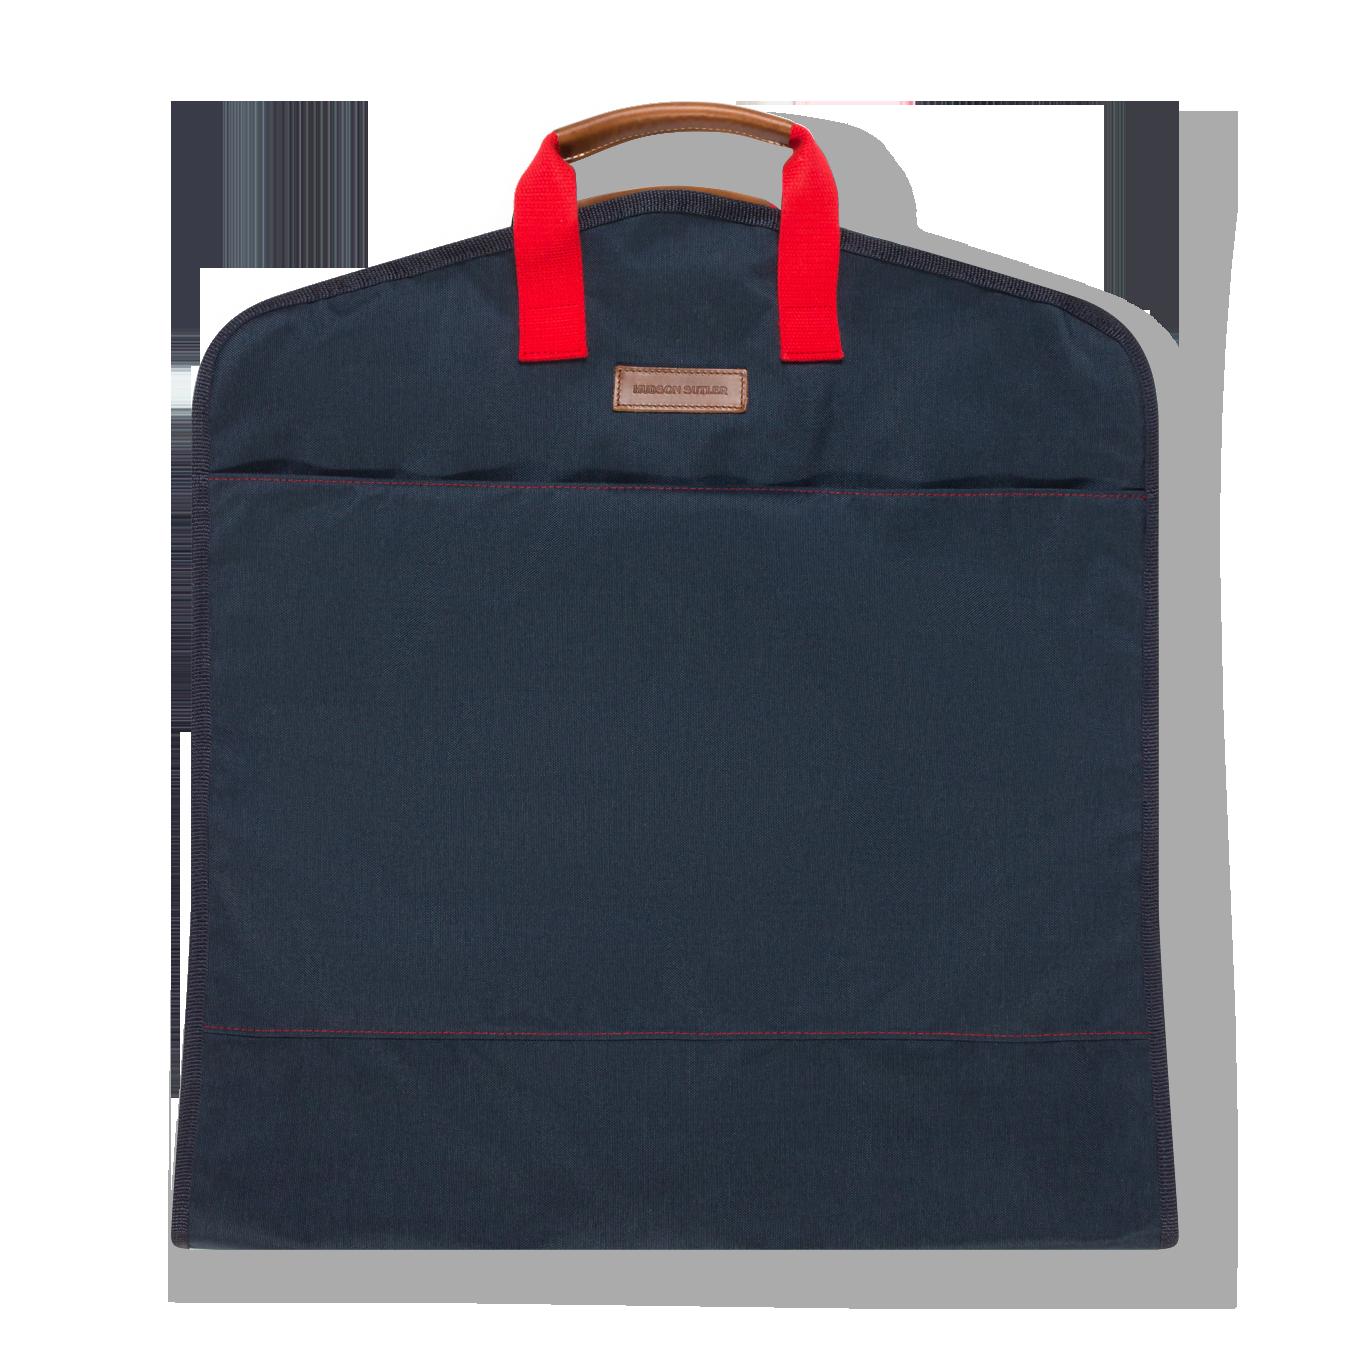 53f0f4dde7 Yorktown Wayfarer Garment Bag